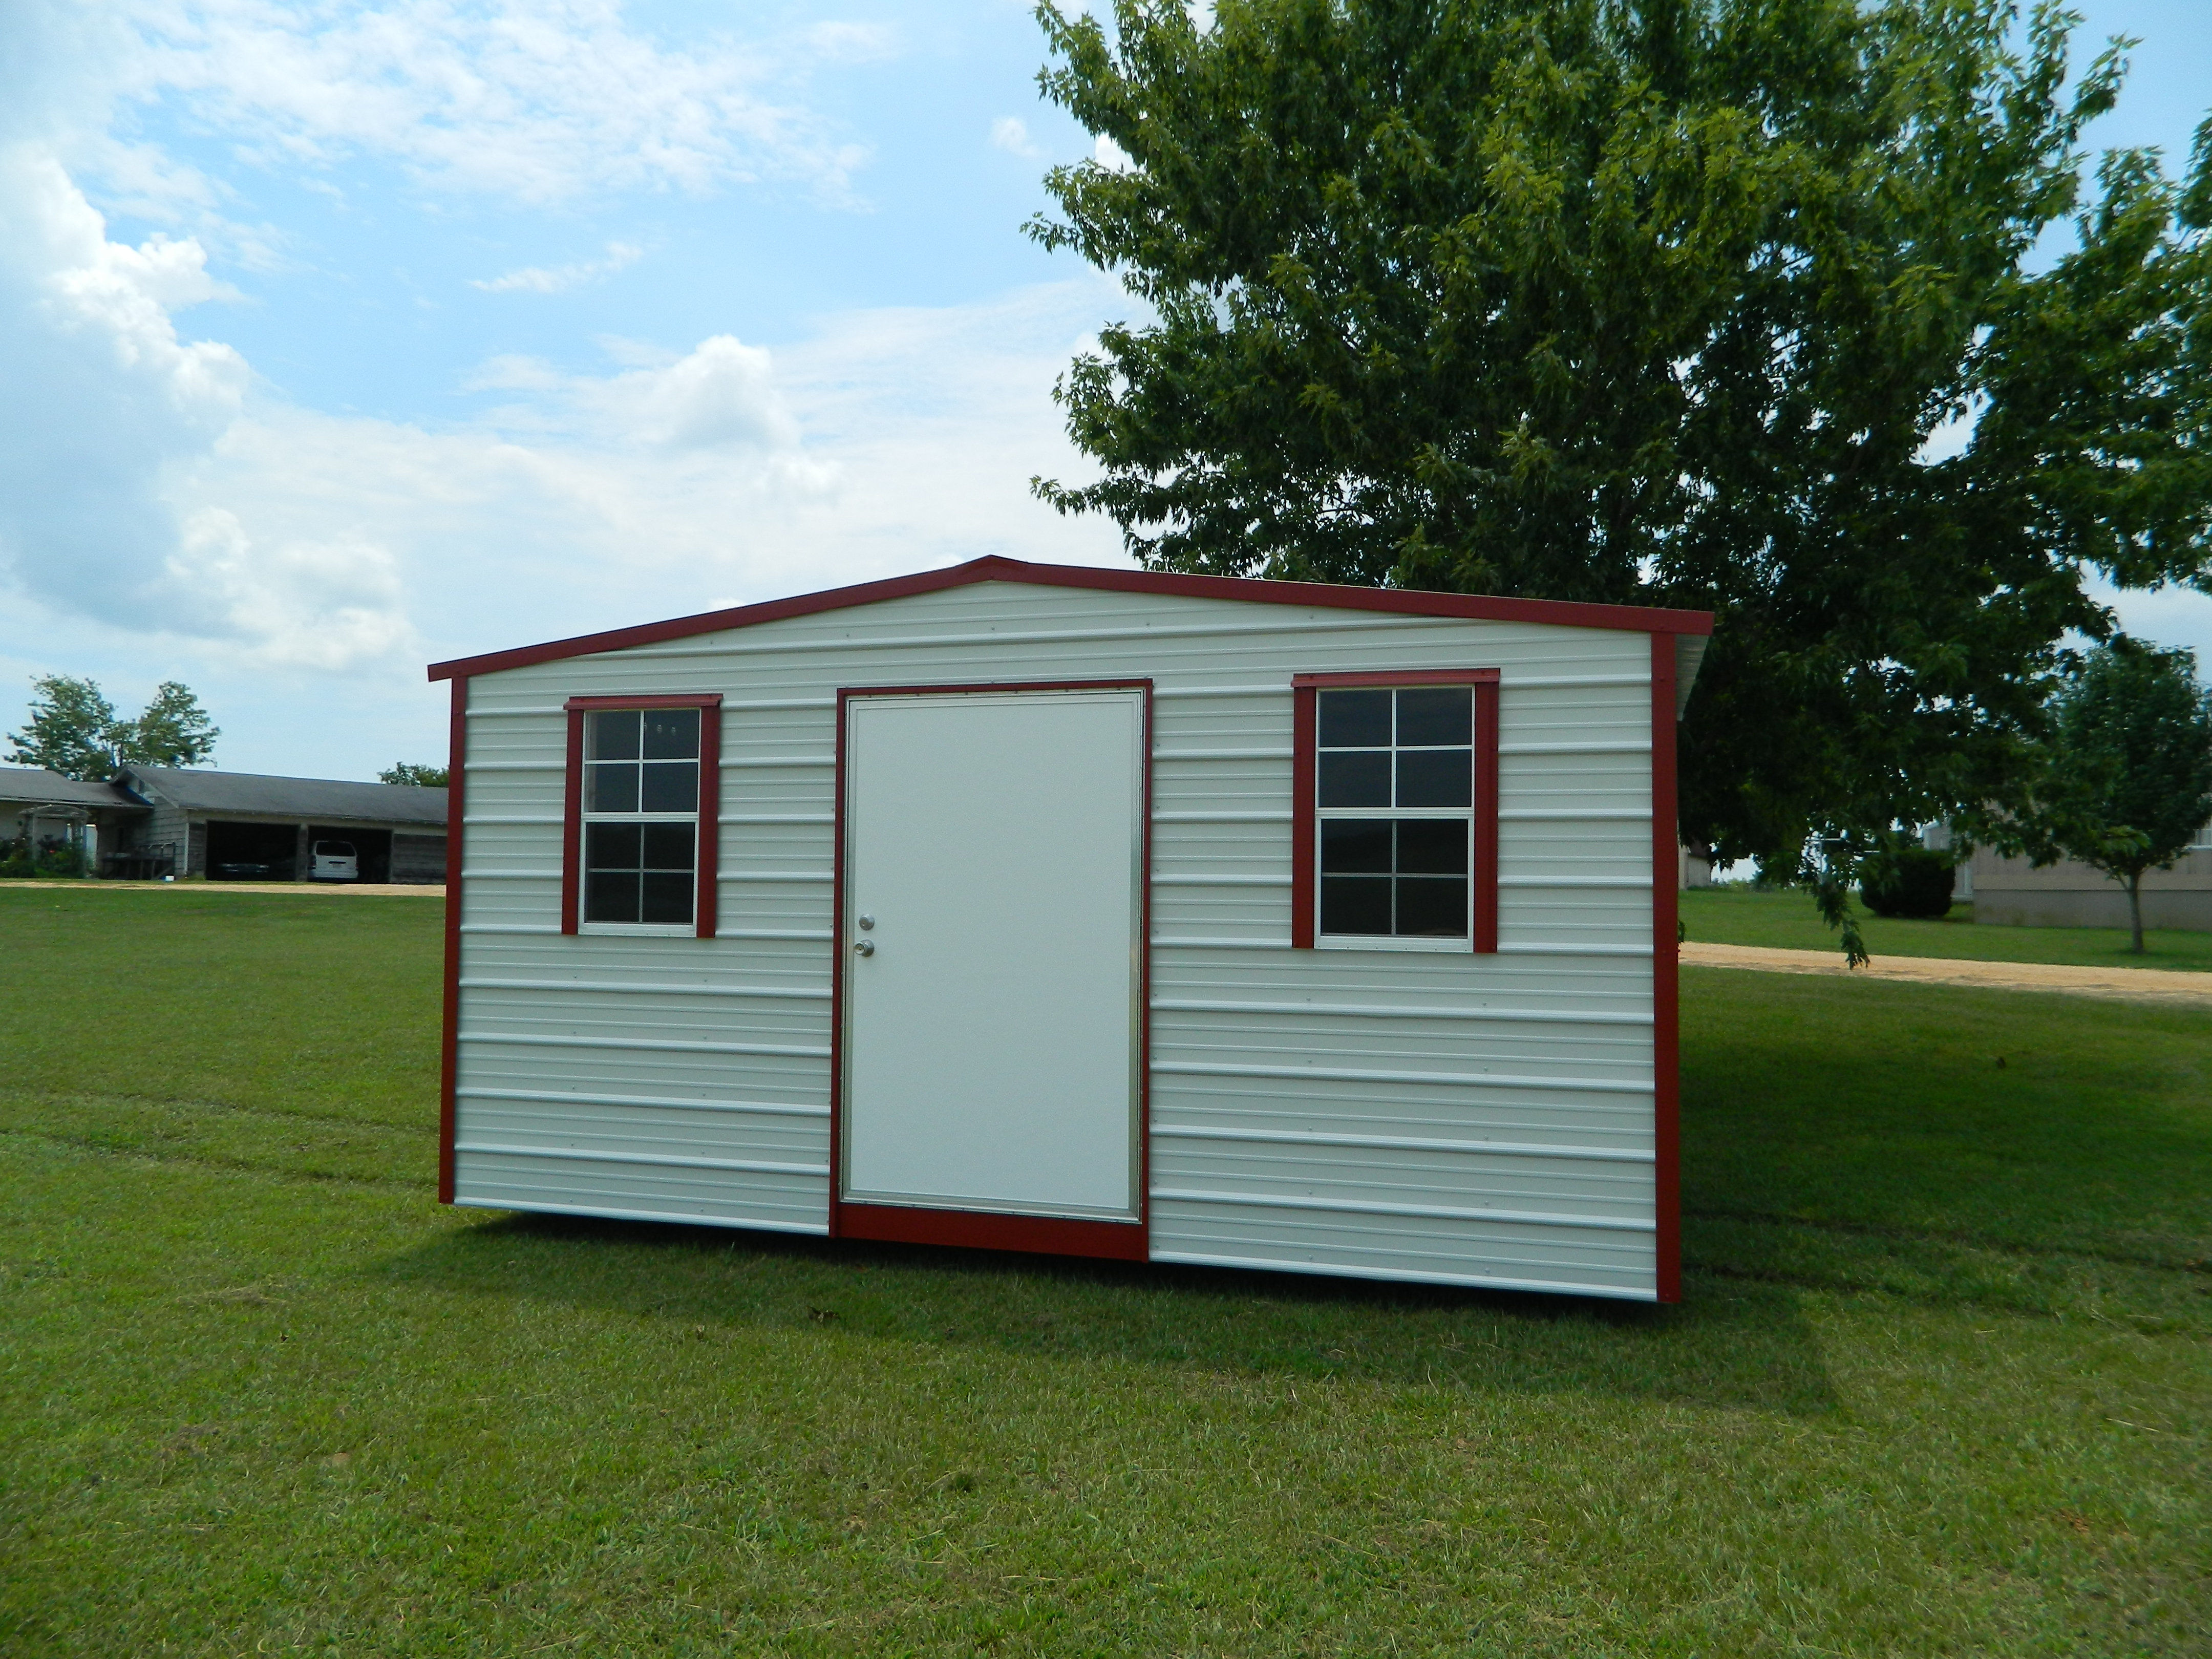 Portable buildings storage buildings storage sheds for Portable storage buildings